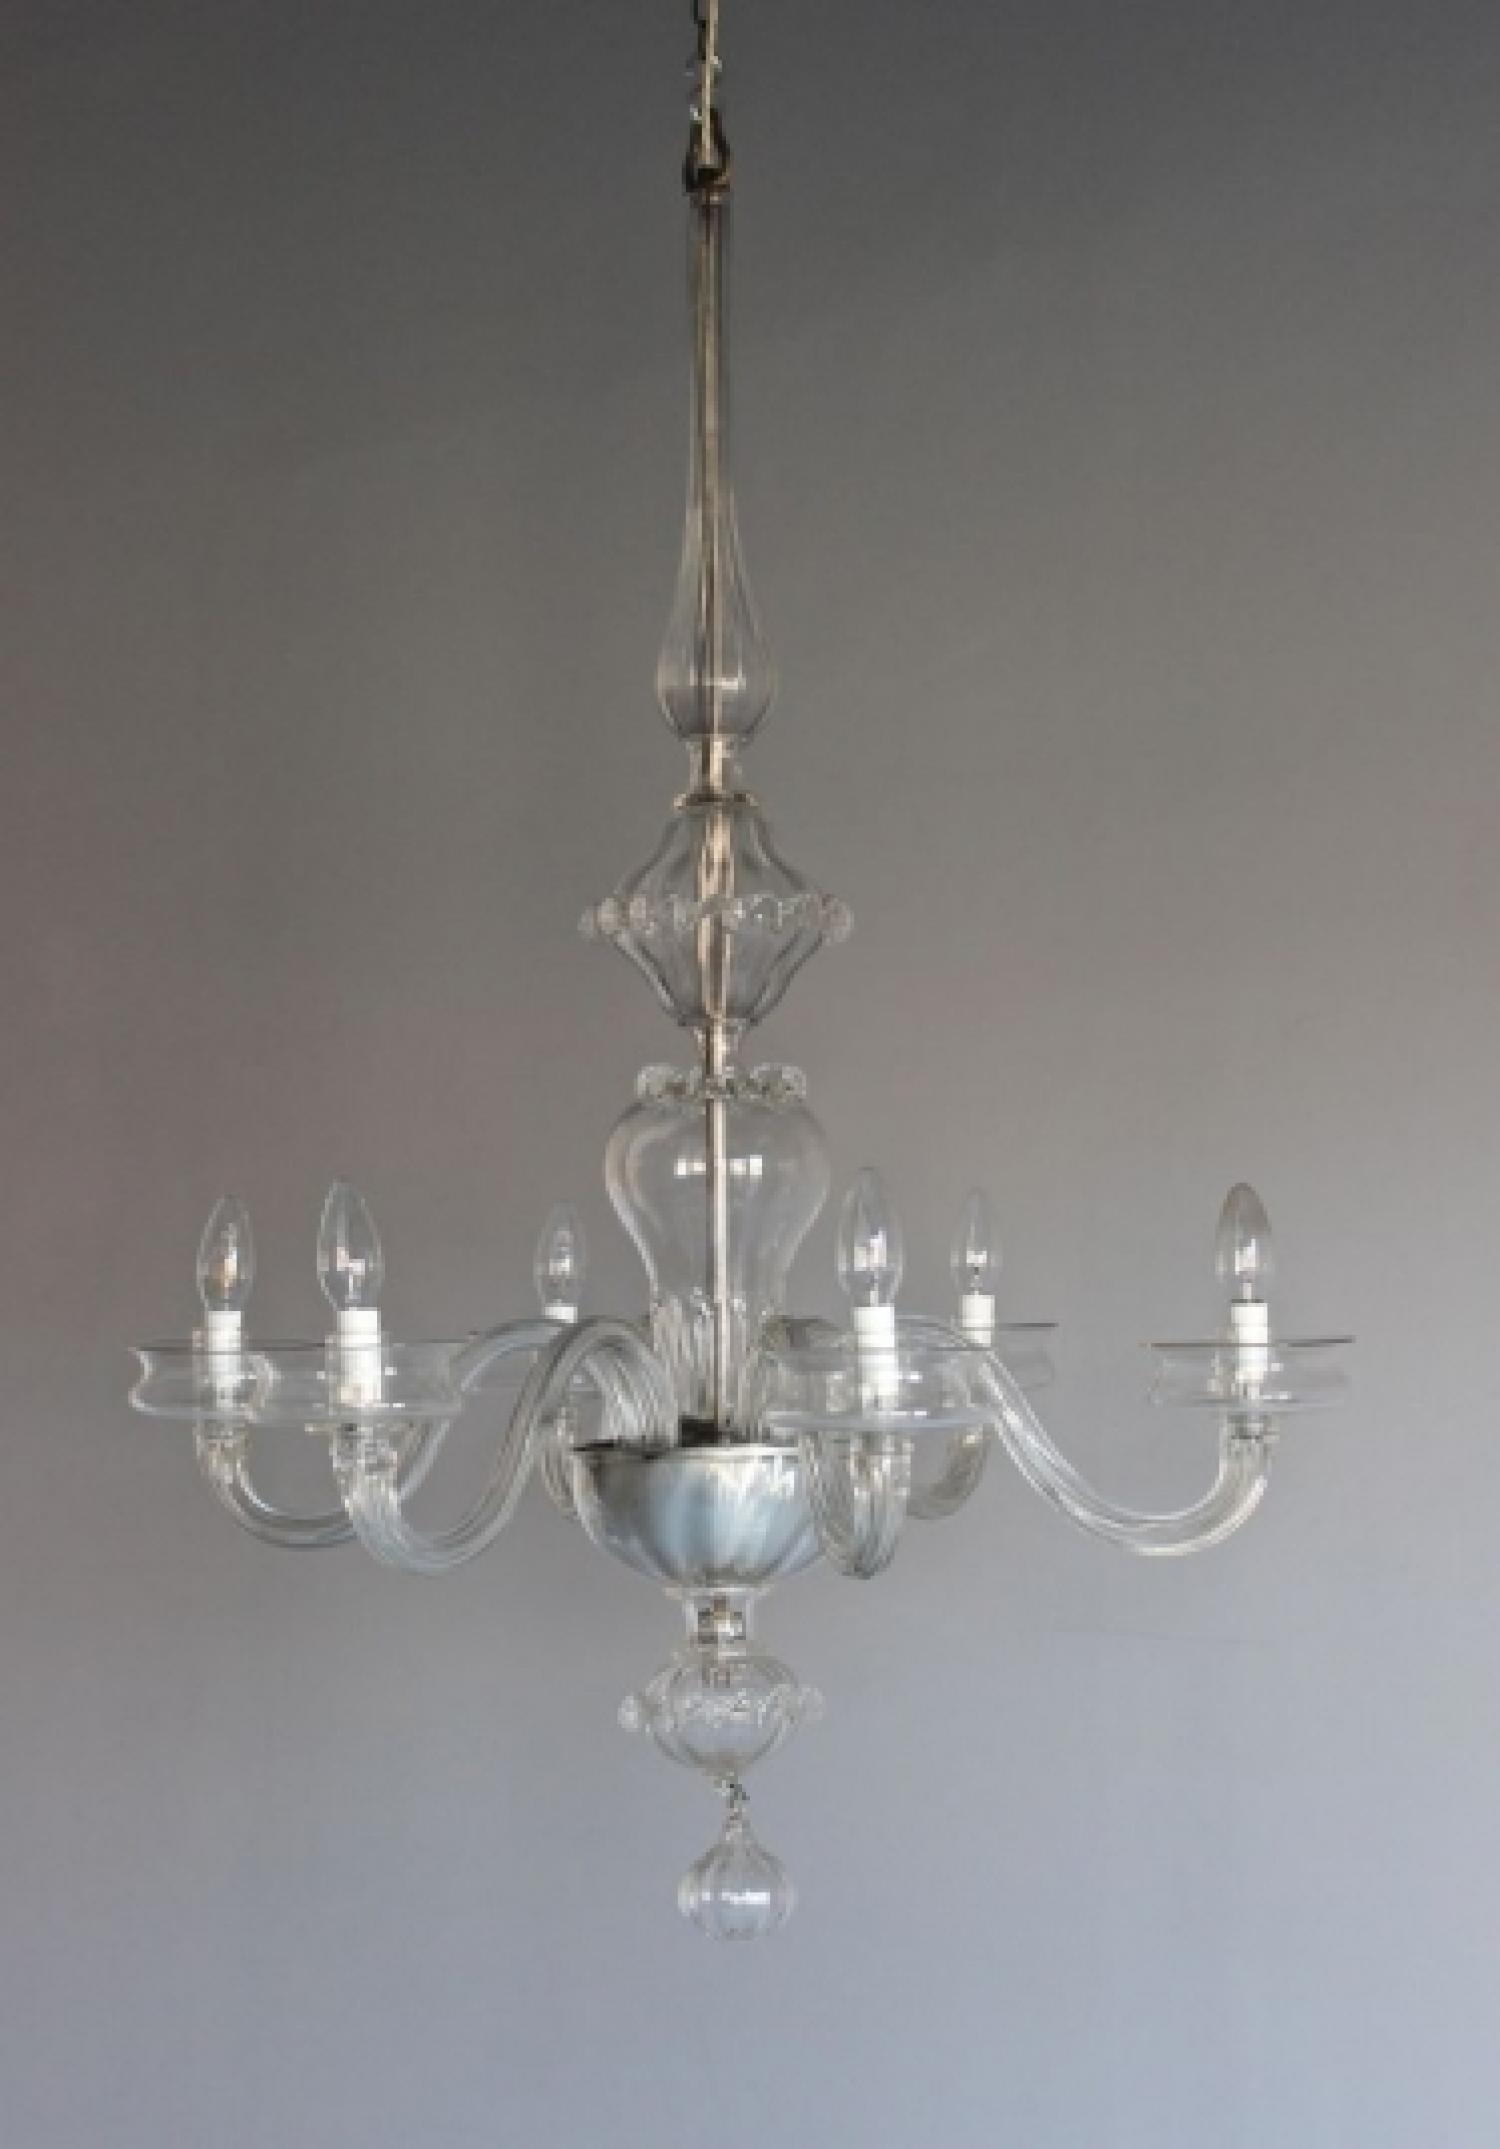 murano due lighting living room dinning. Murano Due Lighting. Antique Lighting In - Image 2 Living Room Dinning C